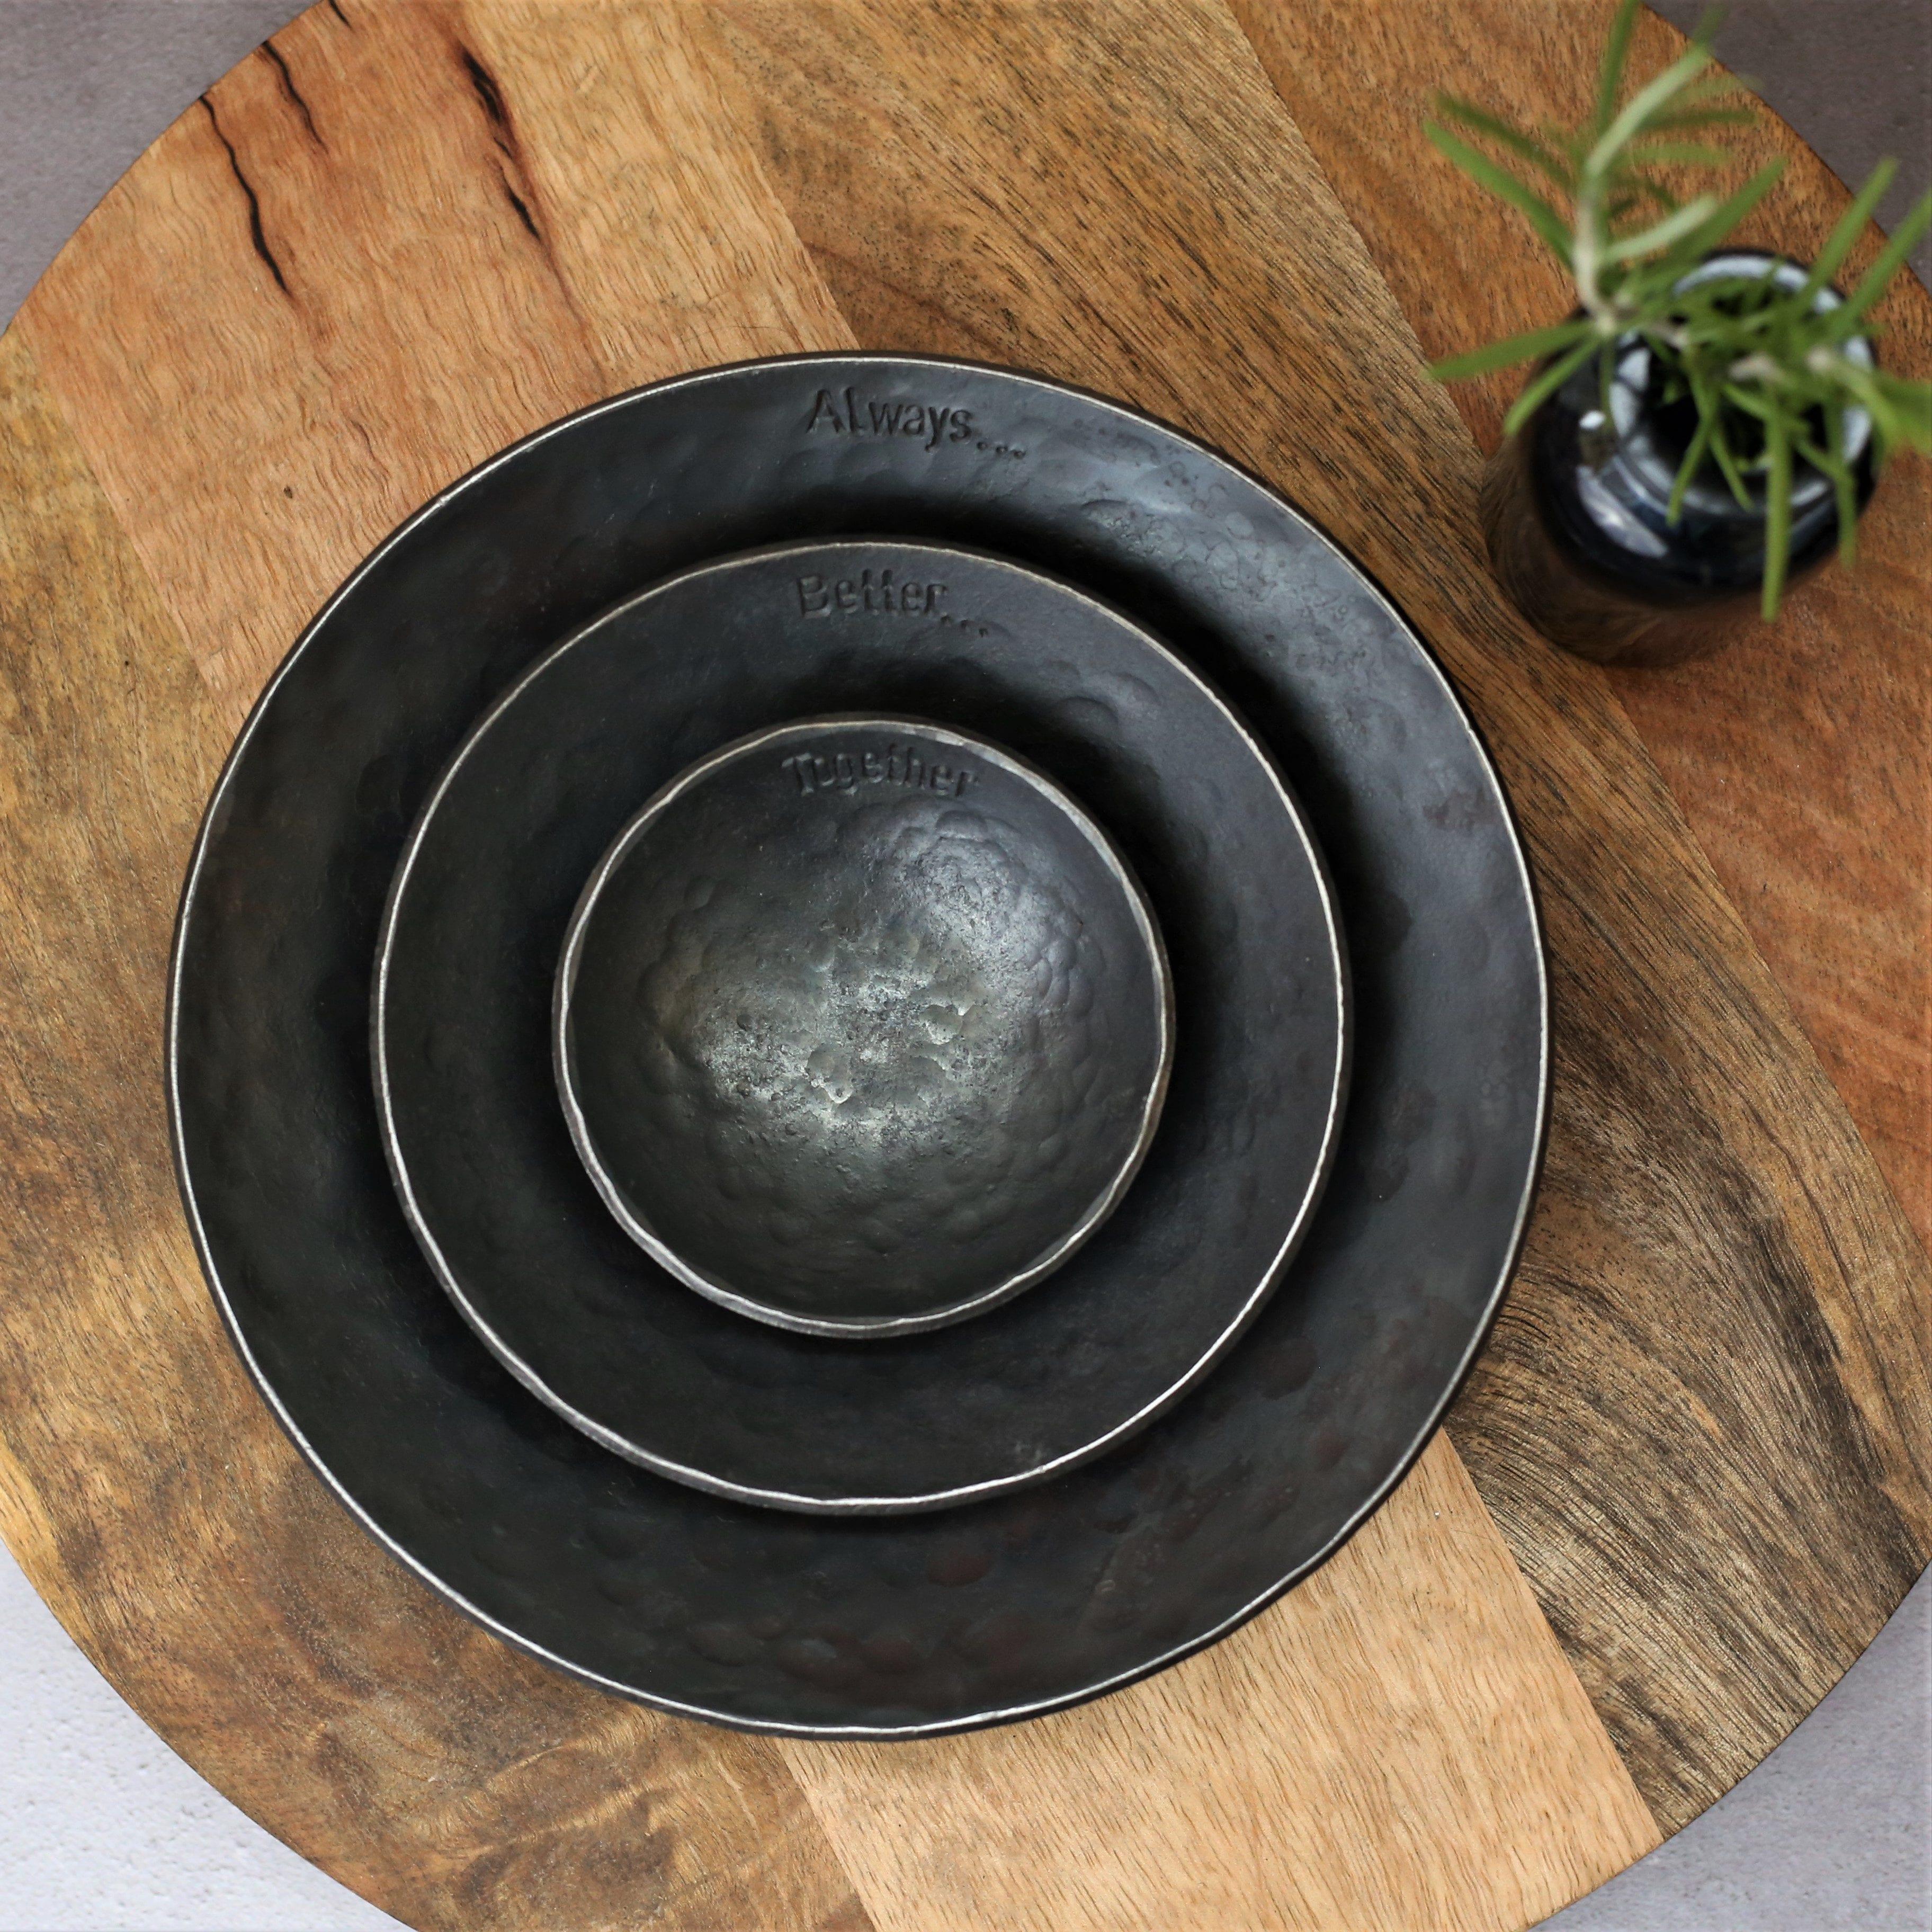 3 Metal Bowls